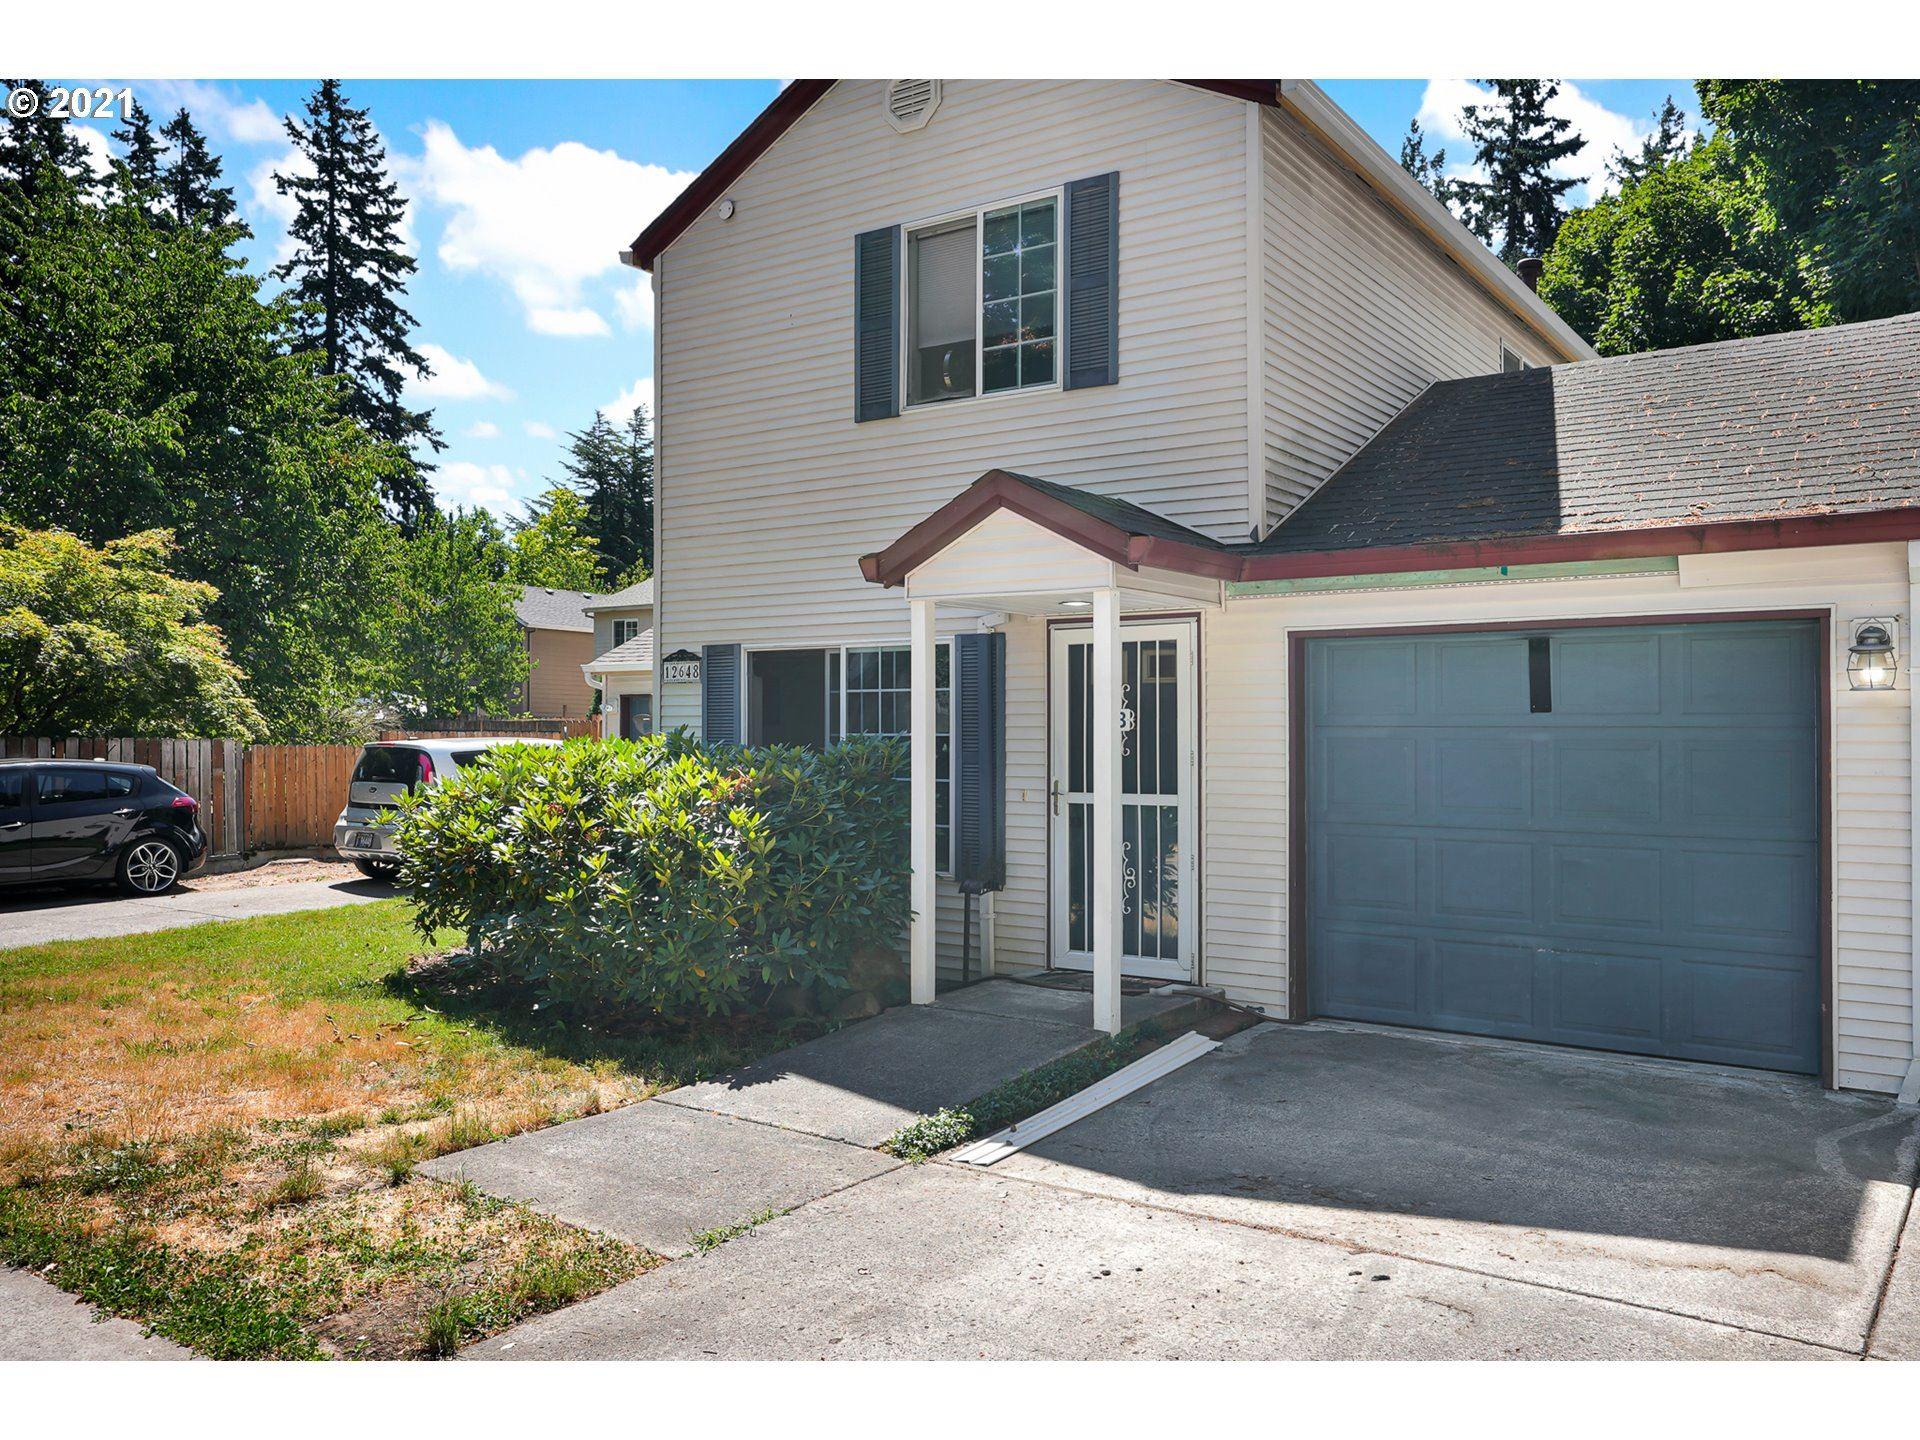 12648 SE FOSTER RD #10B, Portland, OR 97236 - MLS#: 21371995